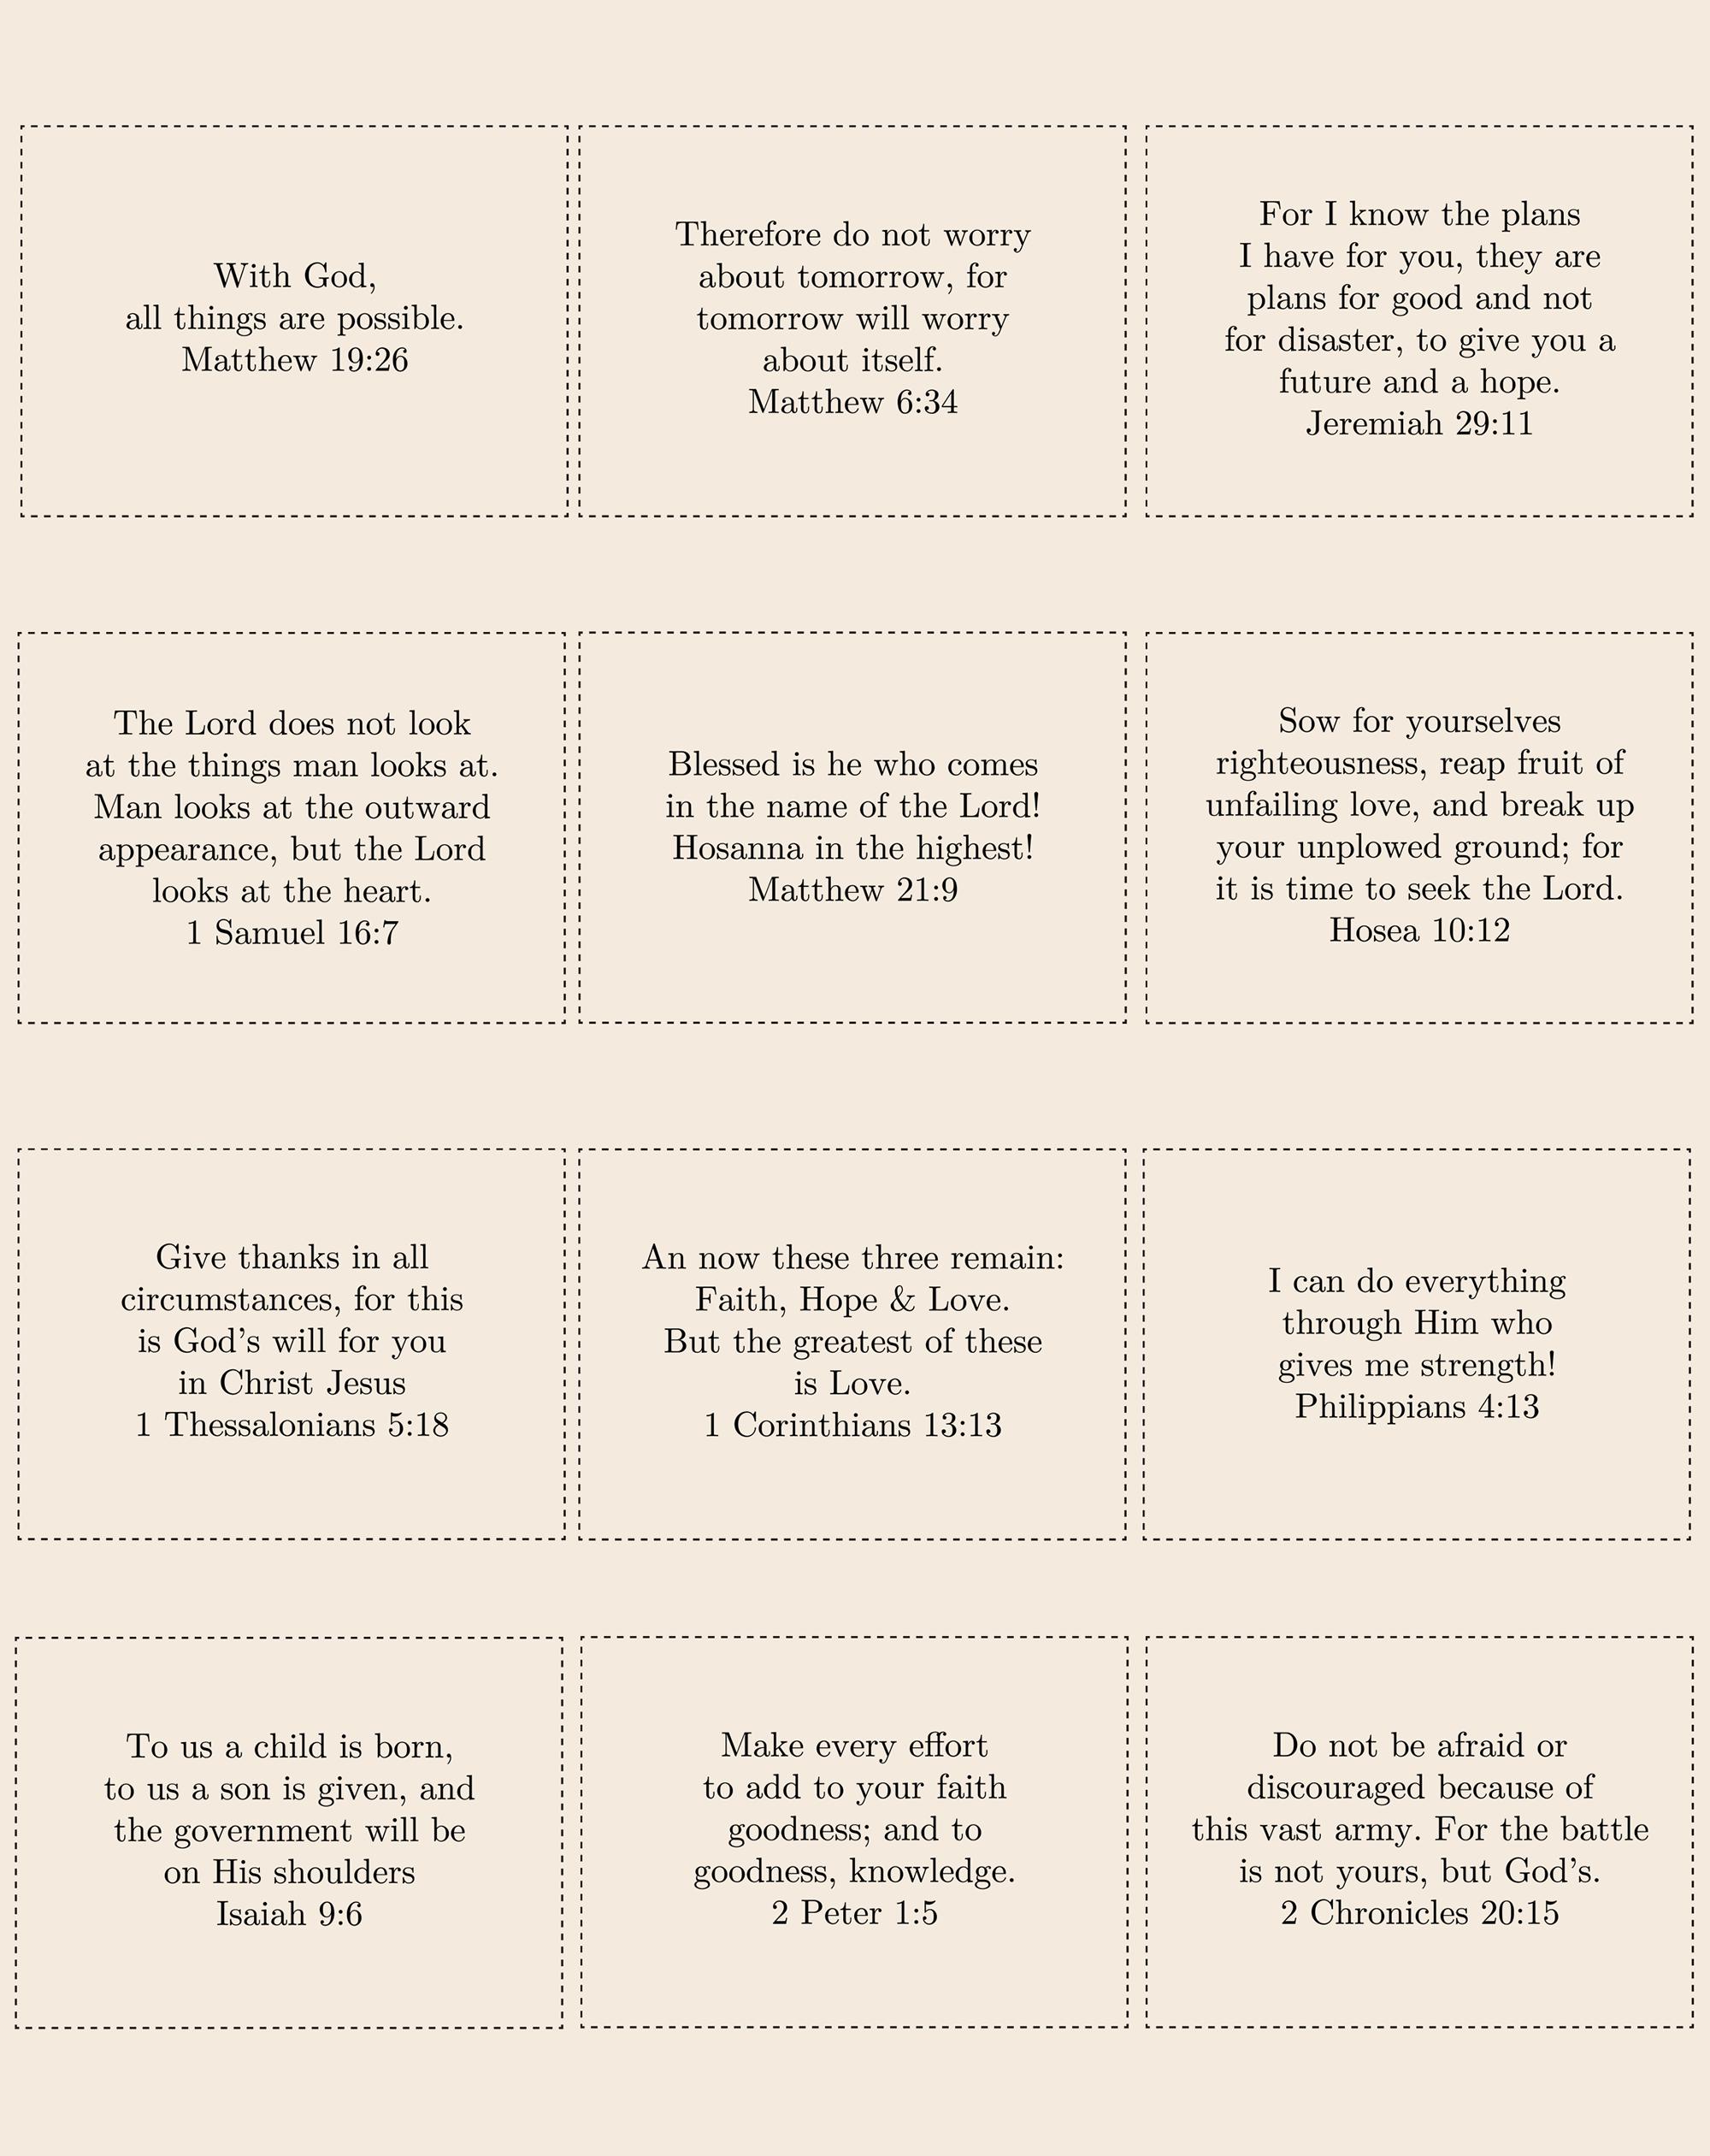 Hearts Bloom in God's Word Scripture Panels